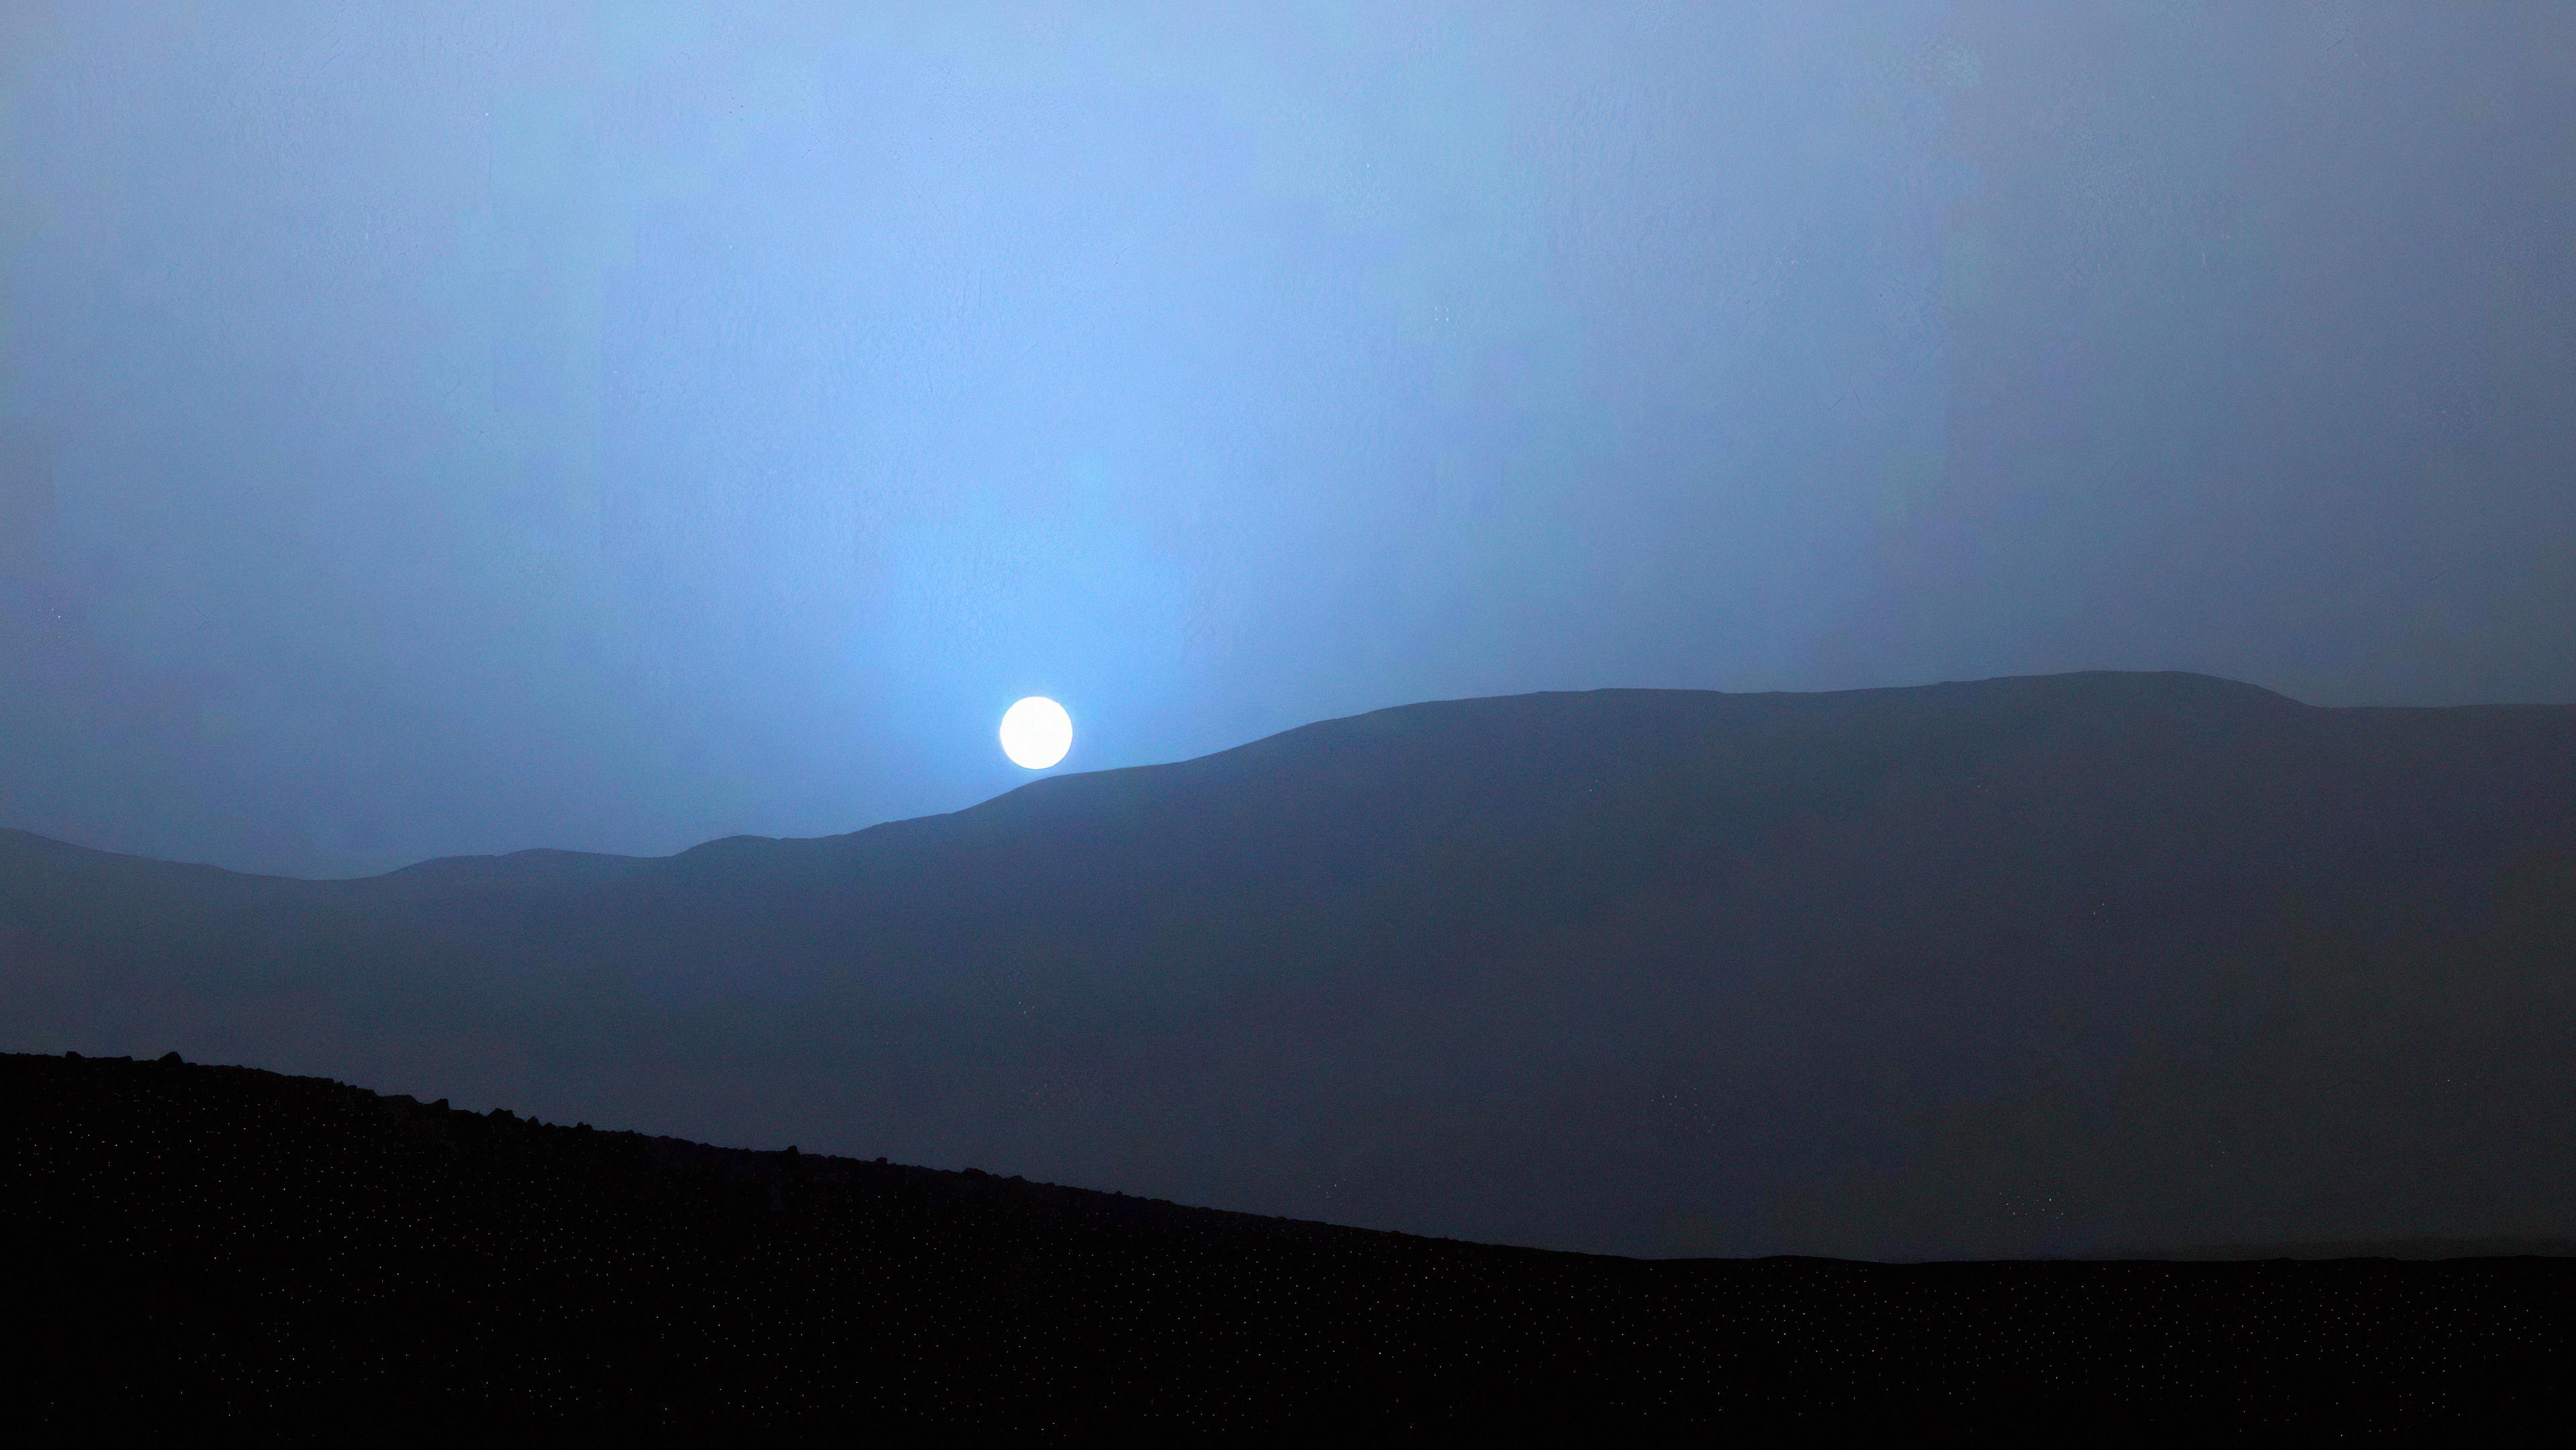 mars sunset 4k 1629256144 - Mars Sunset 4k - Mars Sunset wallpapers, Mars Sunset 4k wallpapers